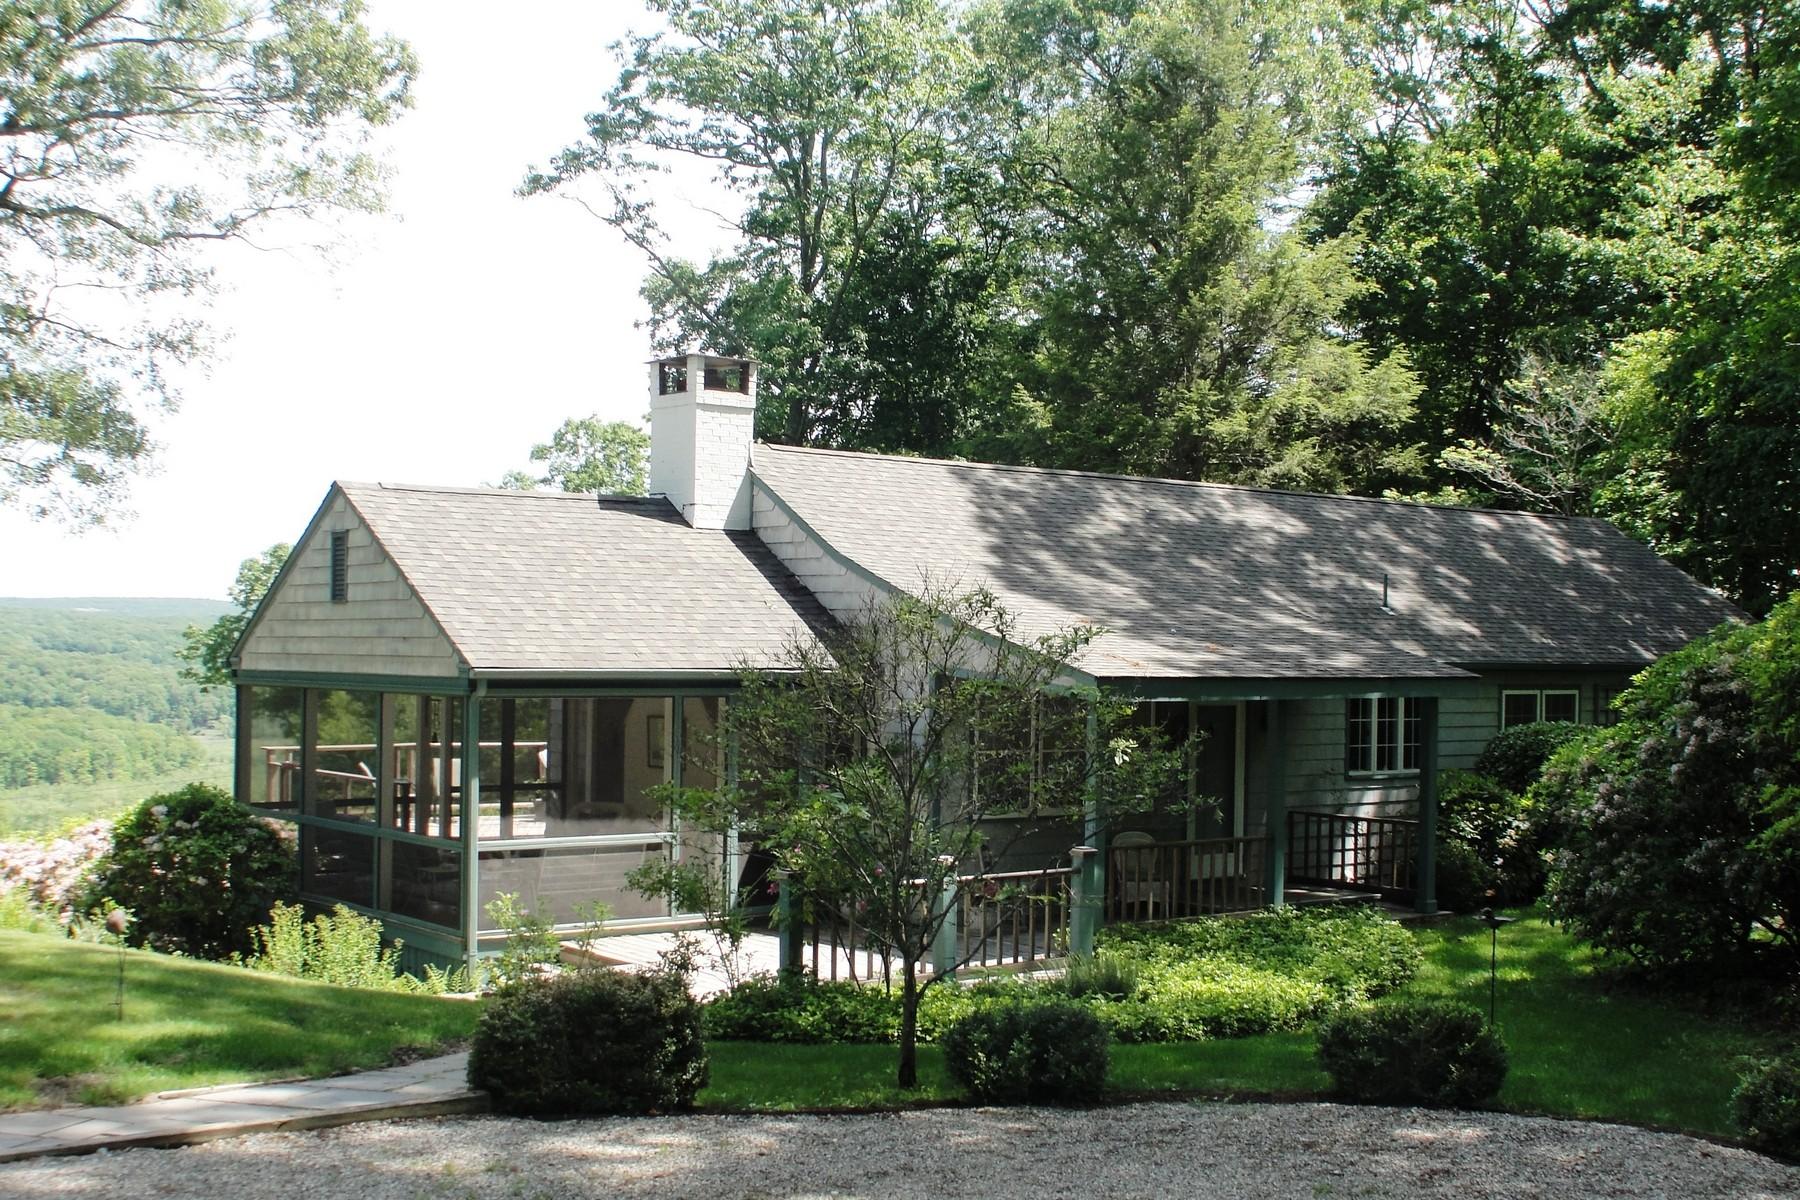 Moradia para Venda às Prime Water View Ranch 20 Lobb Lane Deep River, Connecticut 06417 Estados Unidos